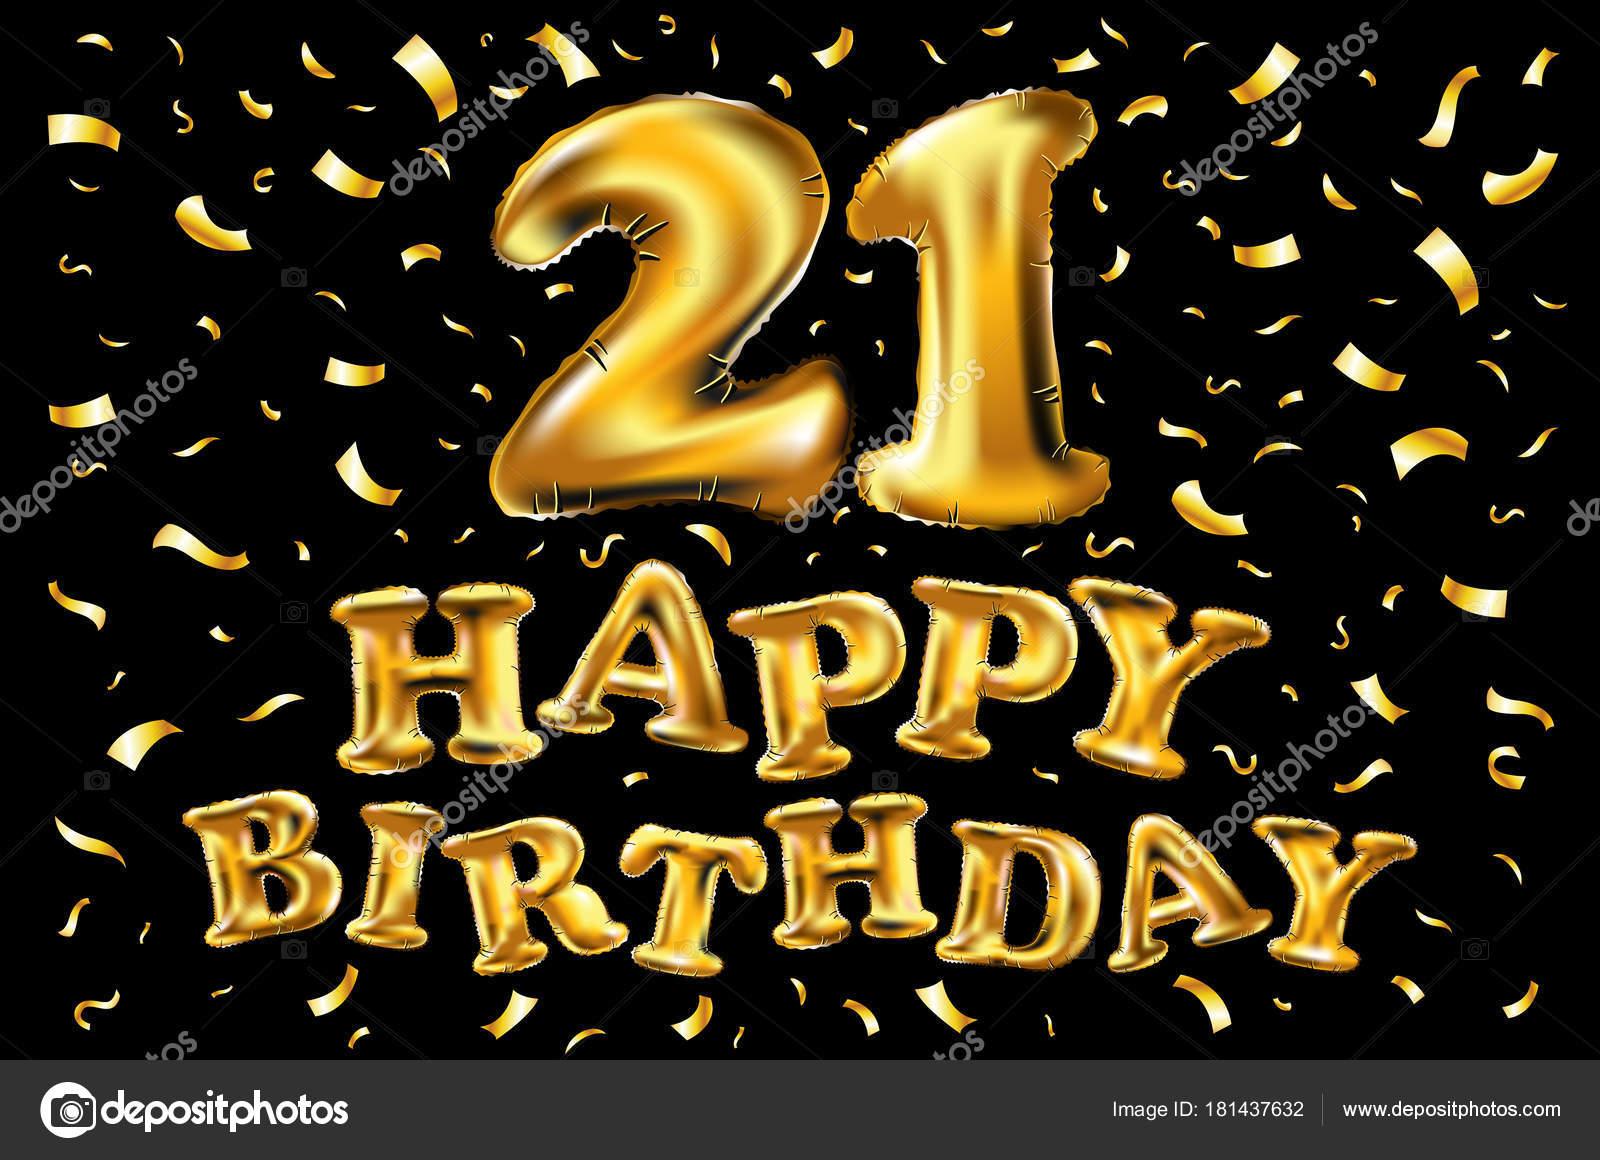 21th Happy Birthday Anniversary Greeting Card Vector Design Vector Image By C Romanchik Ruslan Gmail Com Vector Stock 181437632